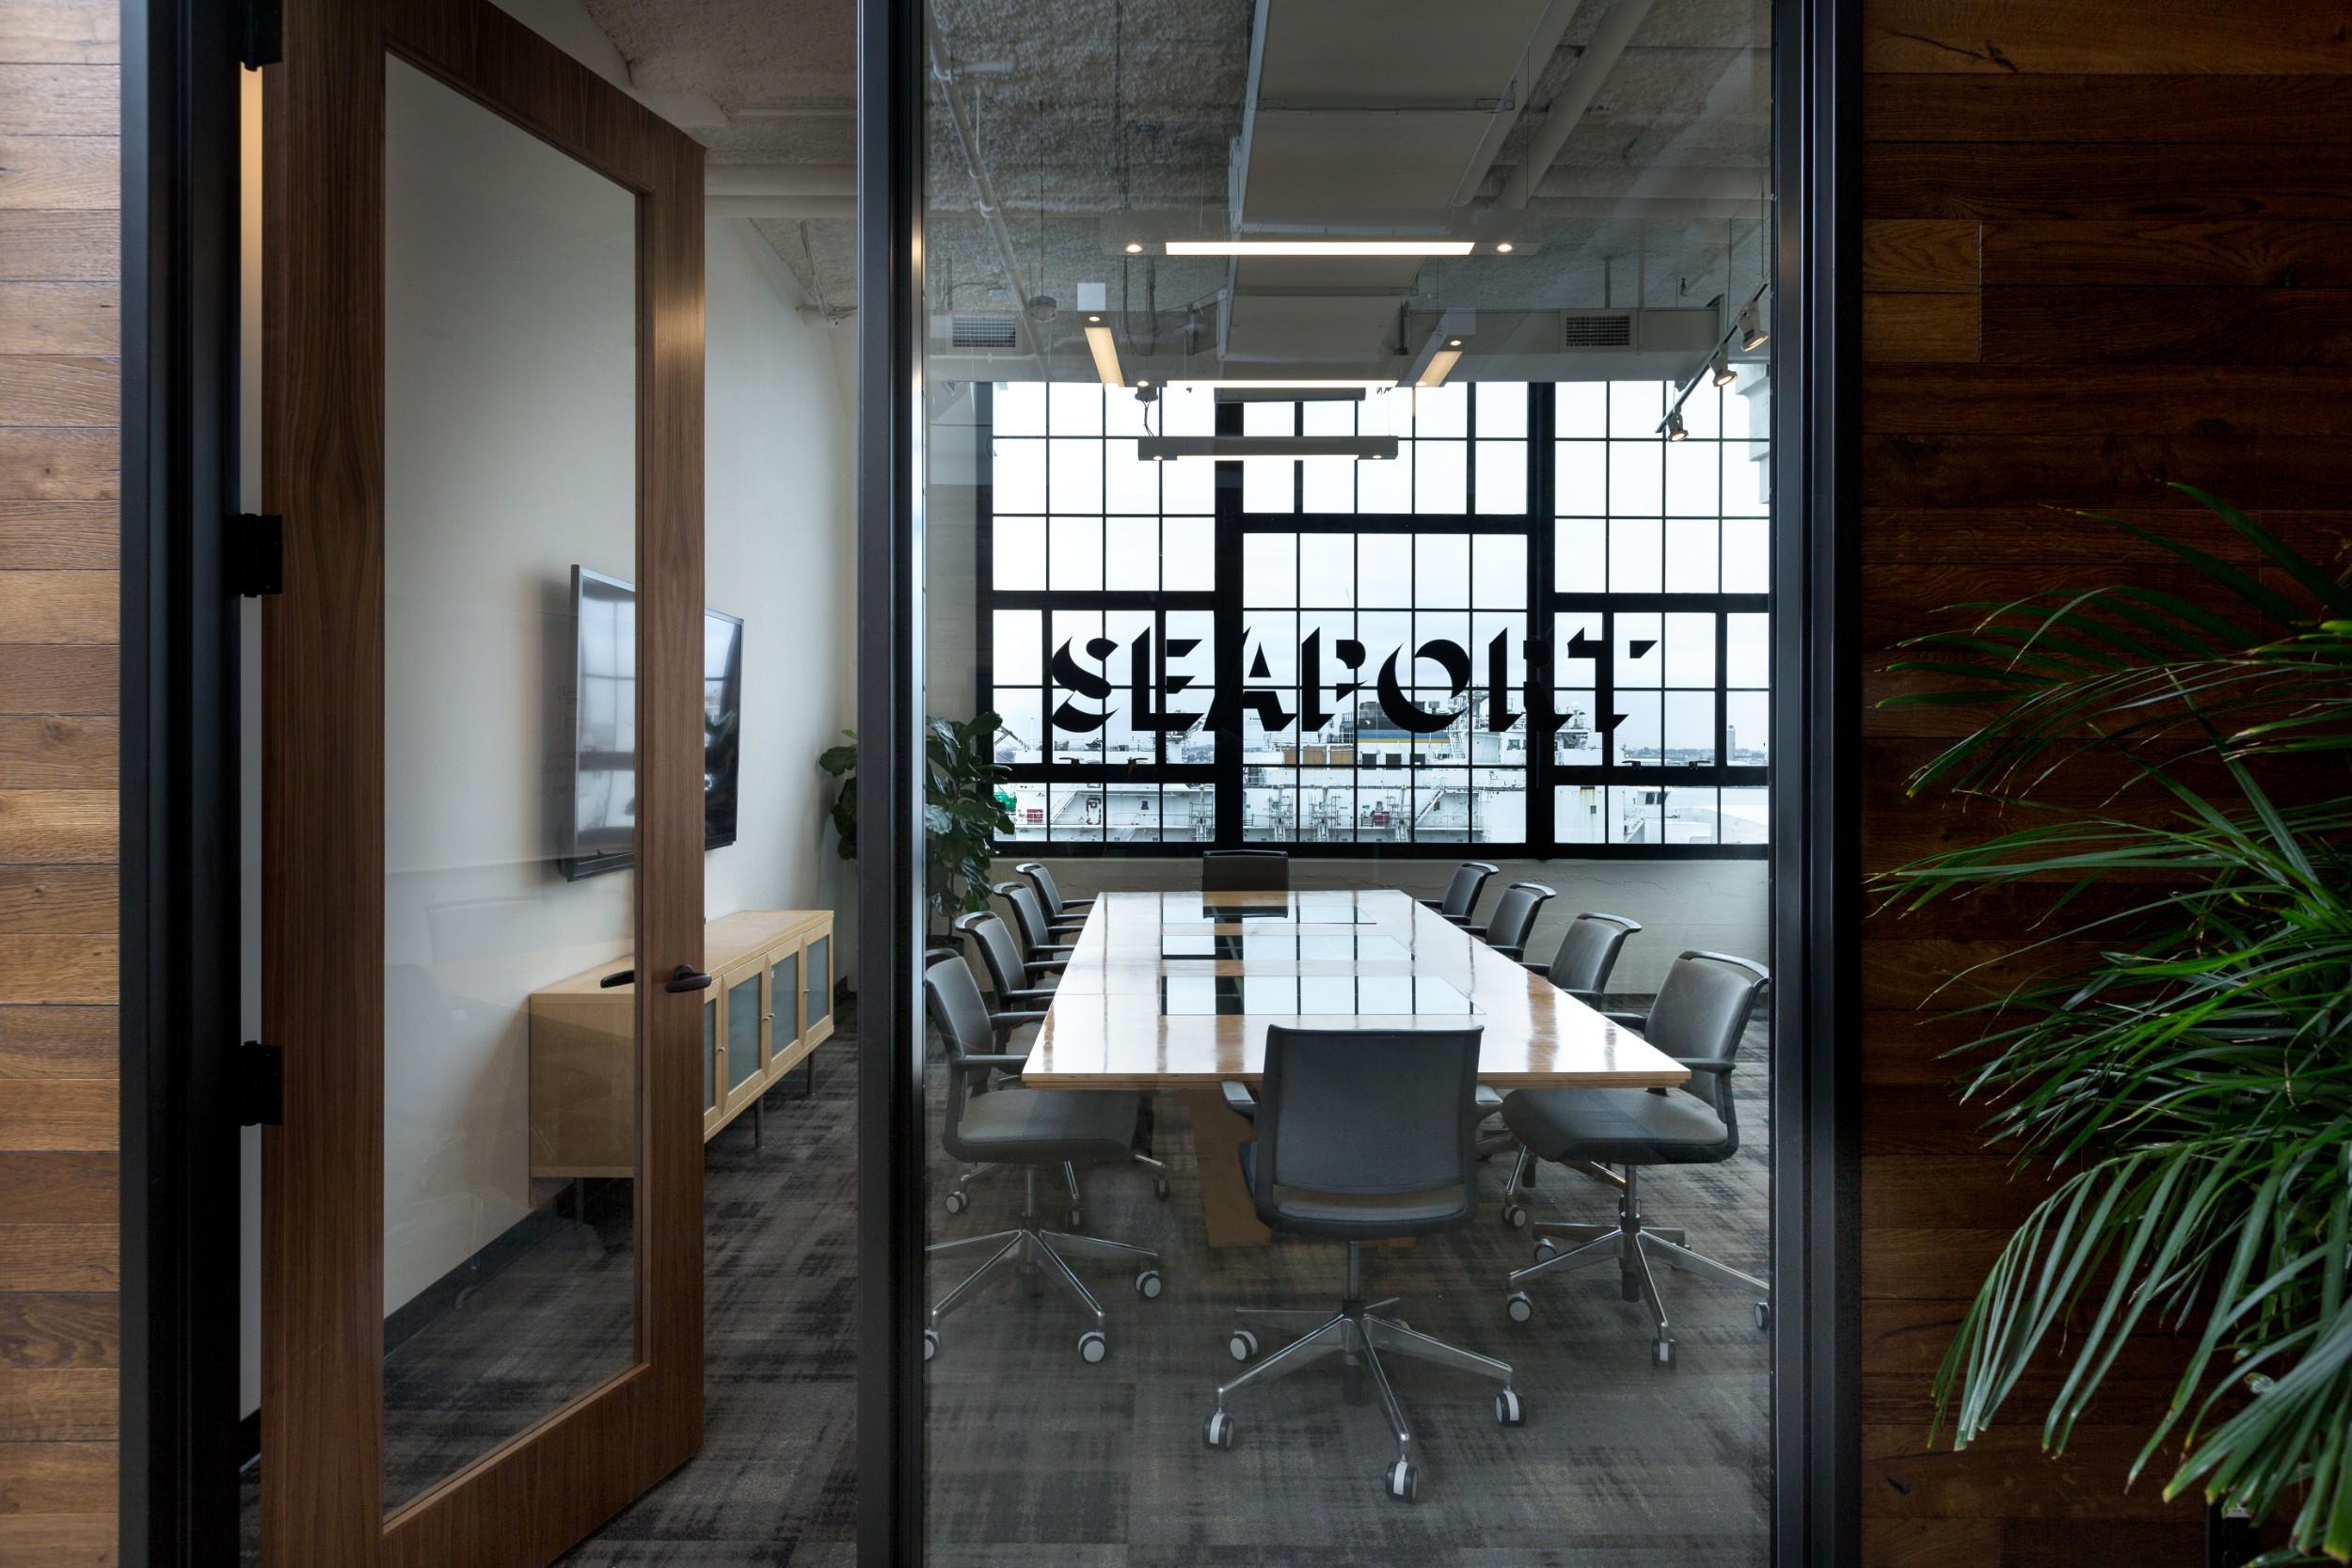 Corderman_Company_Construction_Neoscape_Office_Design_Seaport_Boston_Meeting_Room.jpg